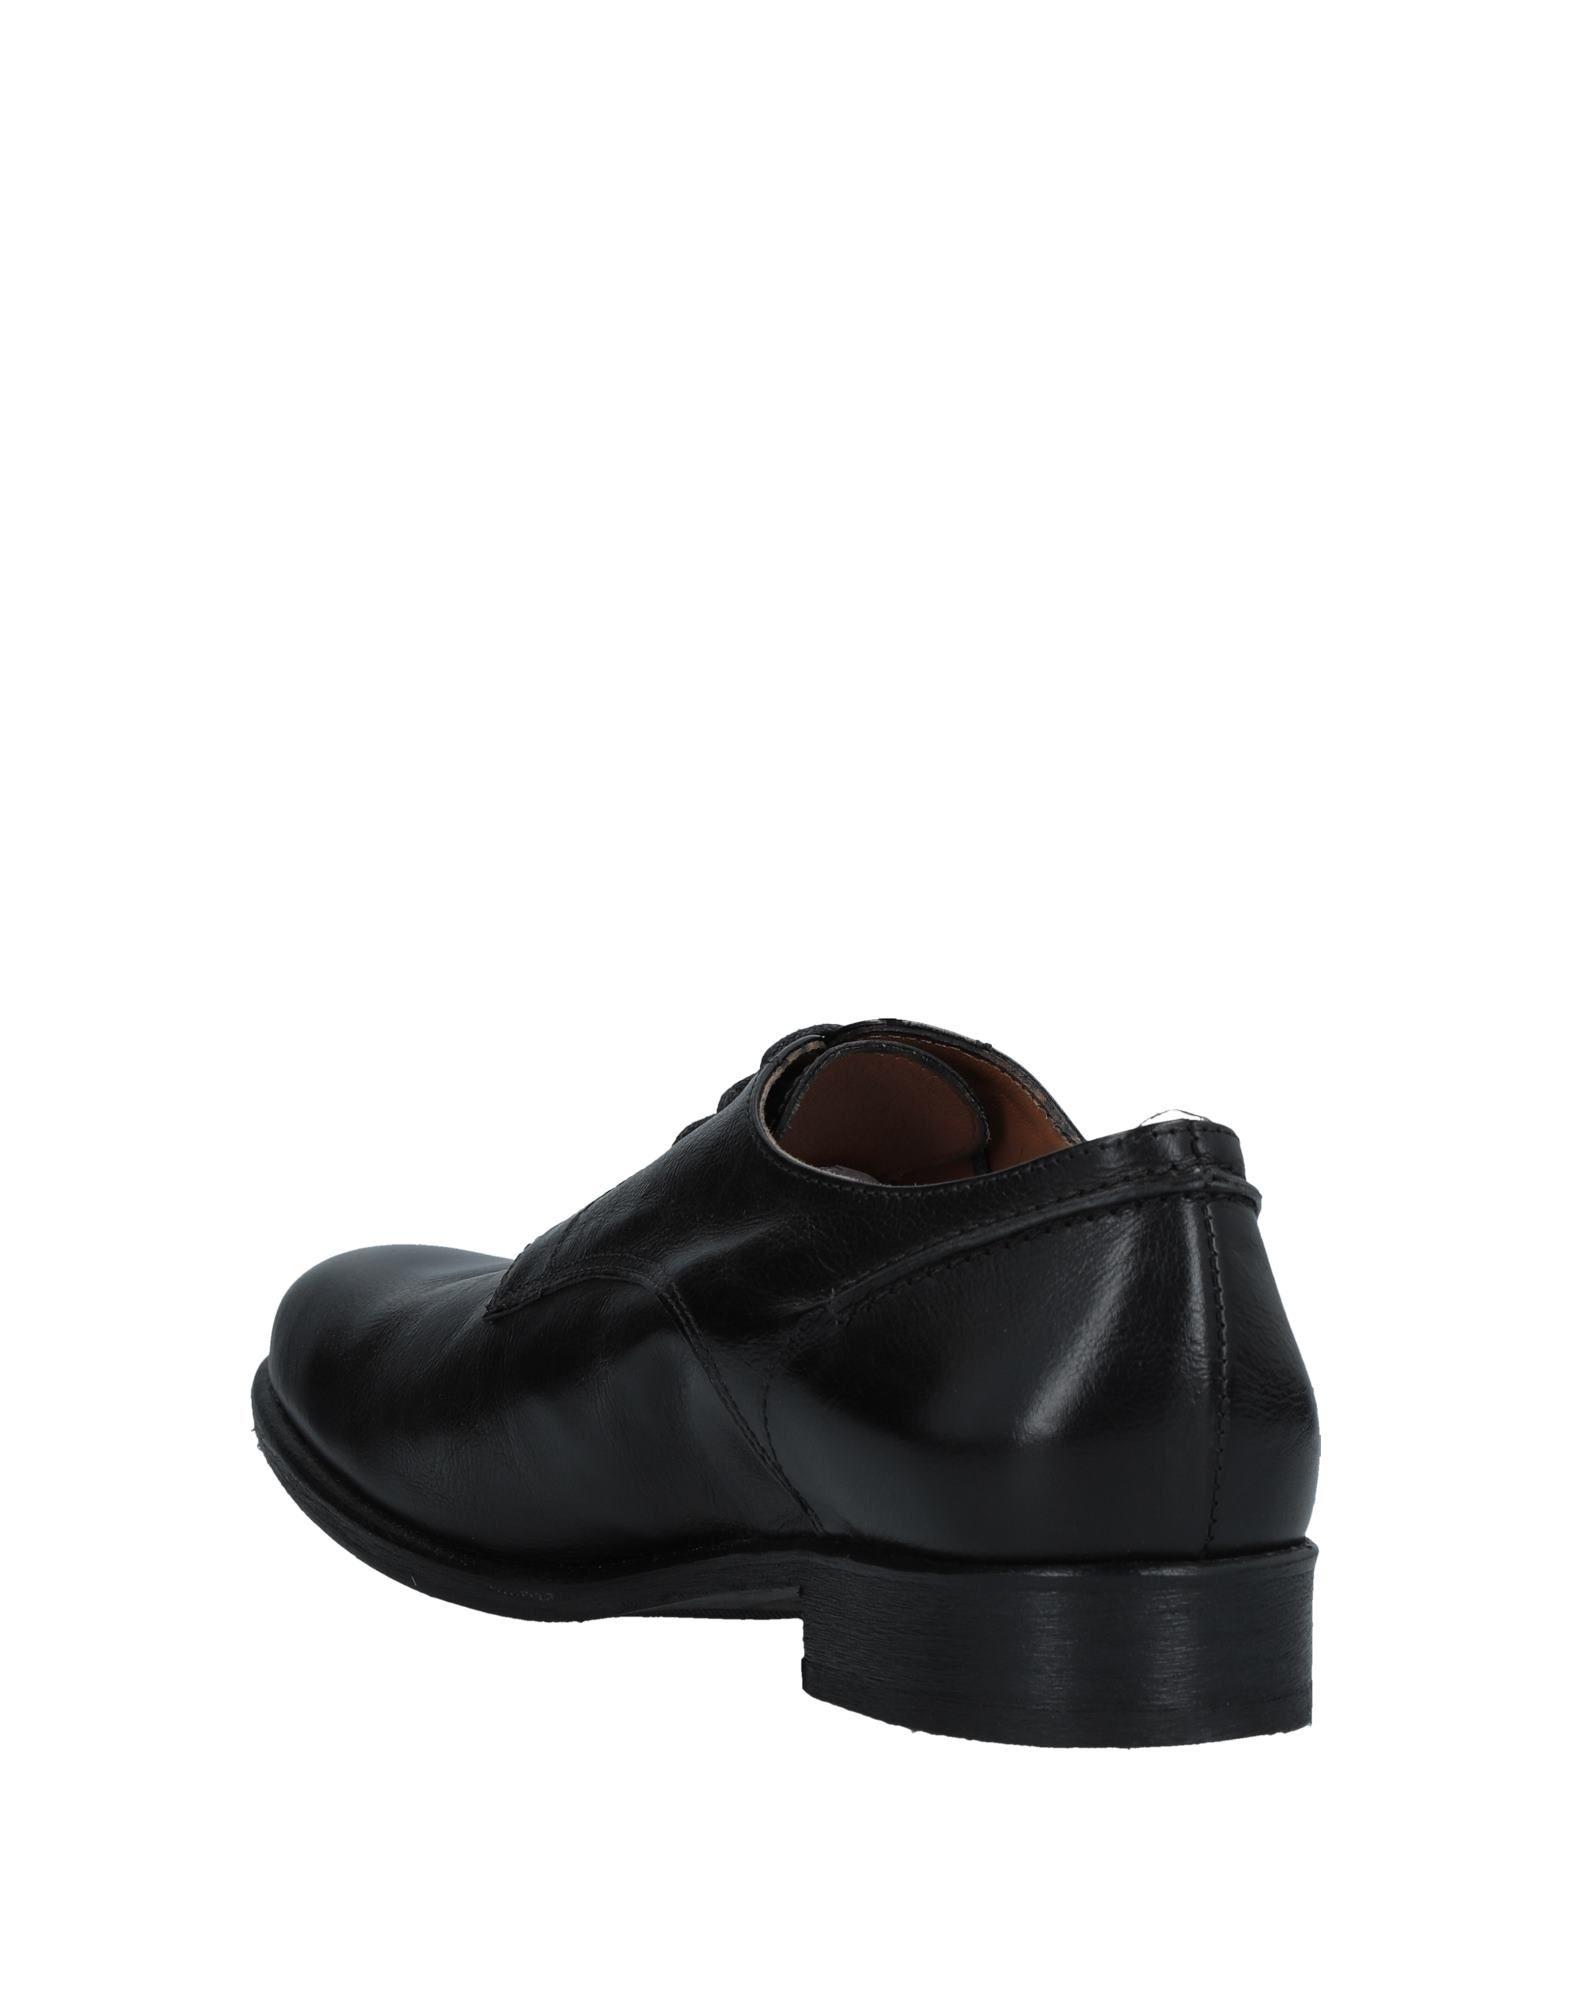 Halmanera Schnürschuhe Damen Qualität  11503332AQ Gute Qualität Damen beliebte Schuhe 672a88